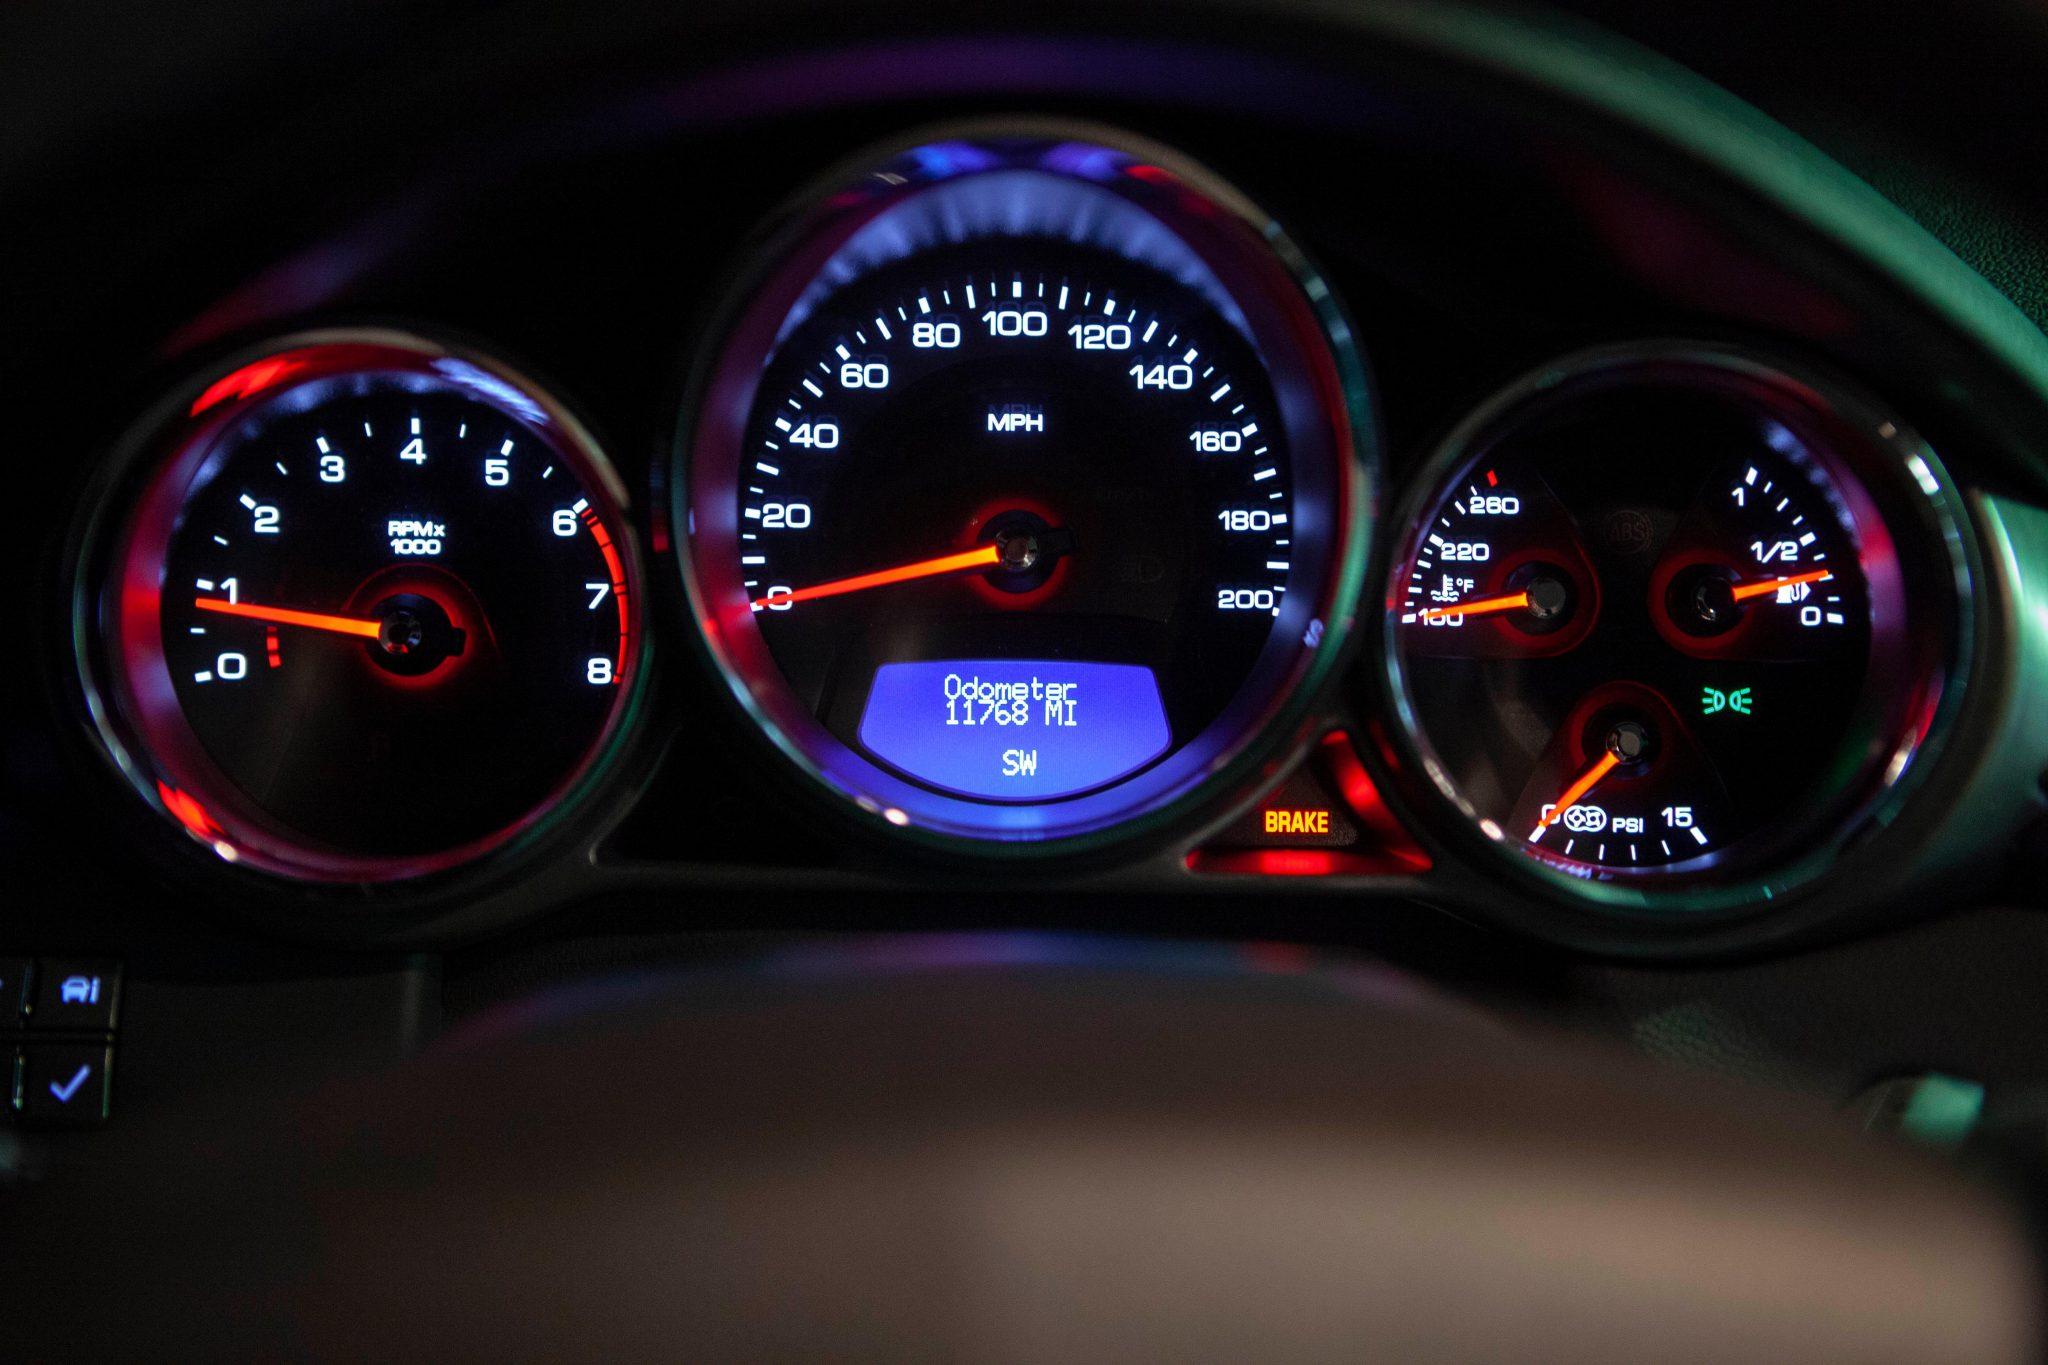 2012 Cadillac CTS-V Wagon dash gauges